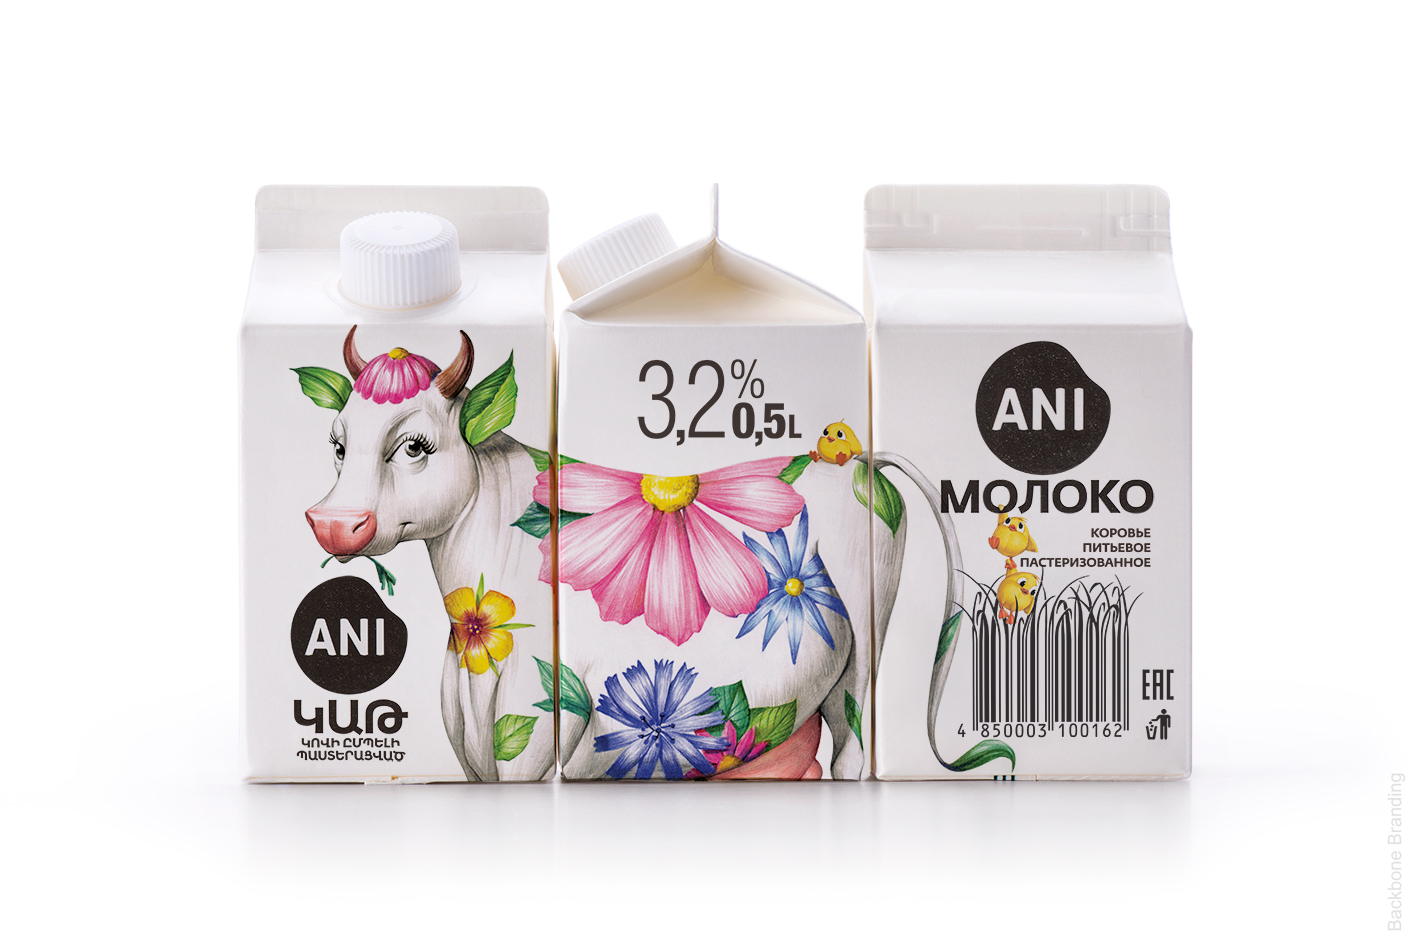 Ani乳制品包装设计